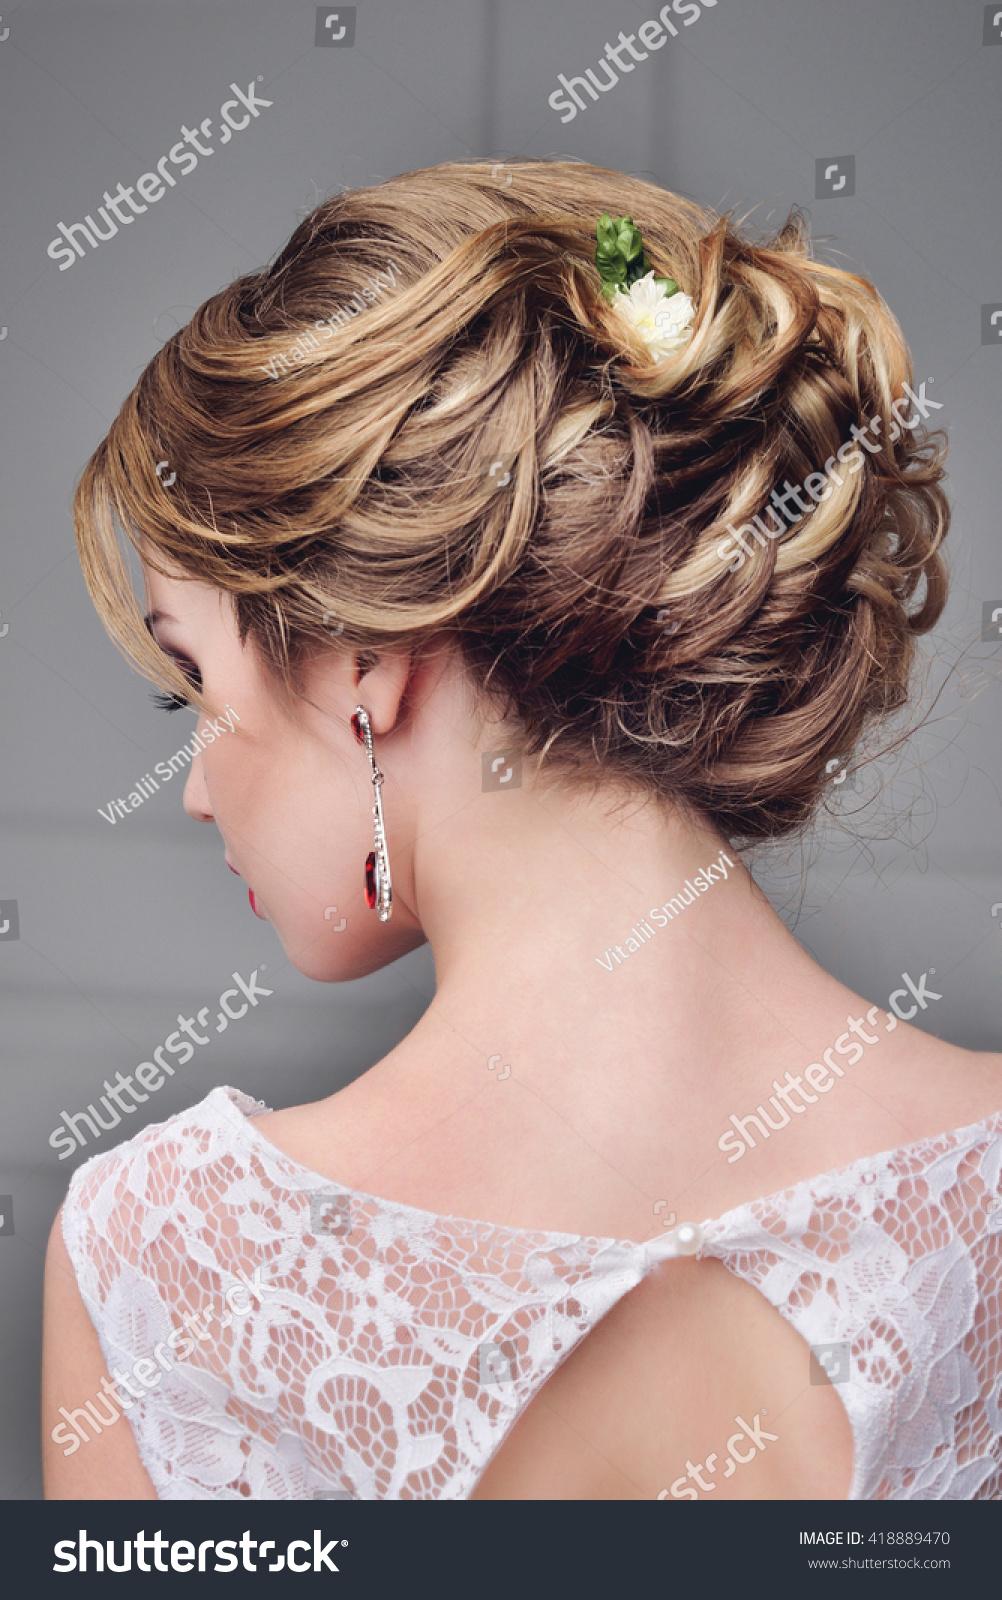 Beautiful Bride Portrait Wedding Makeup Hairstyle Stock Photo ...